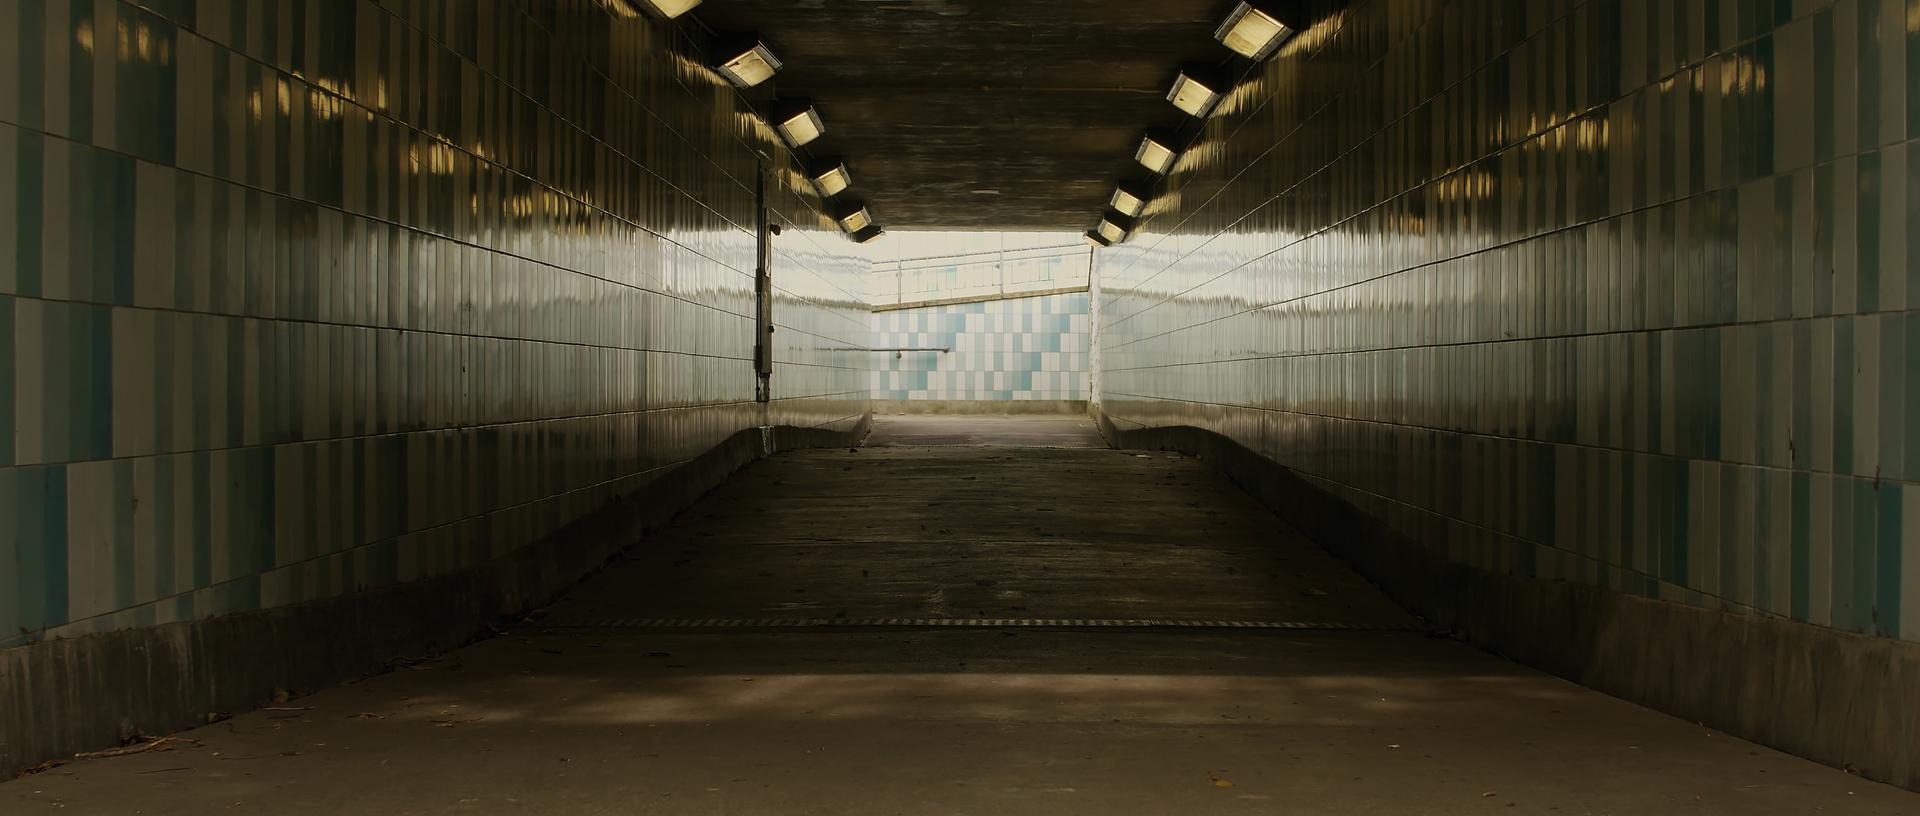 03_Underpass_1